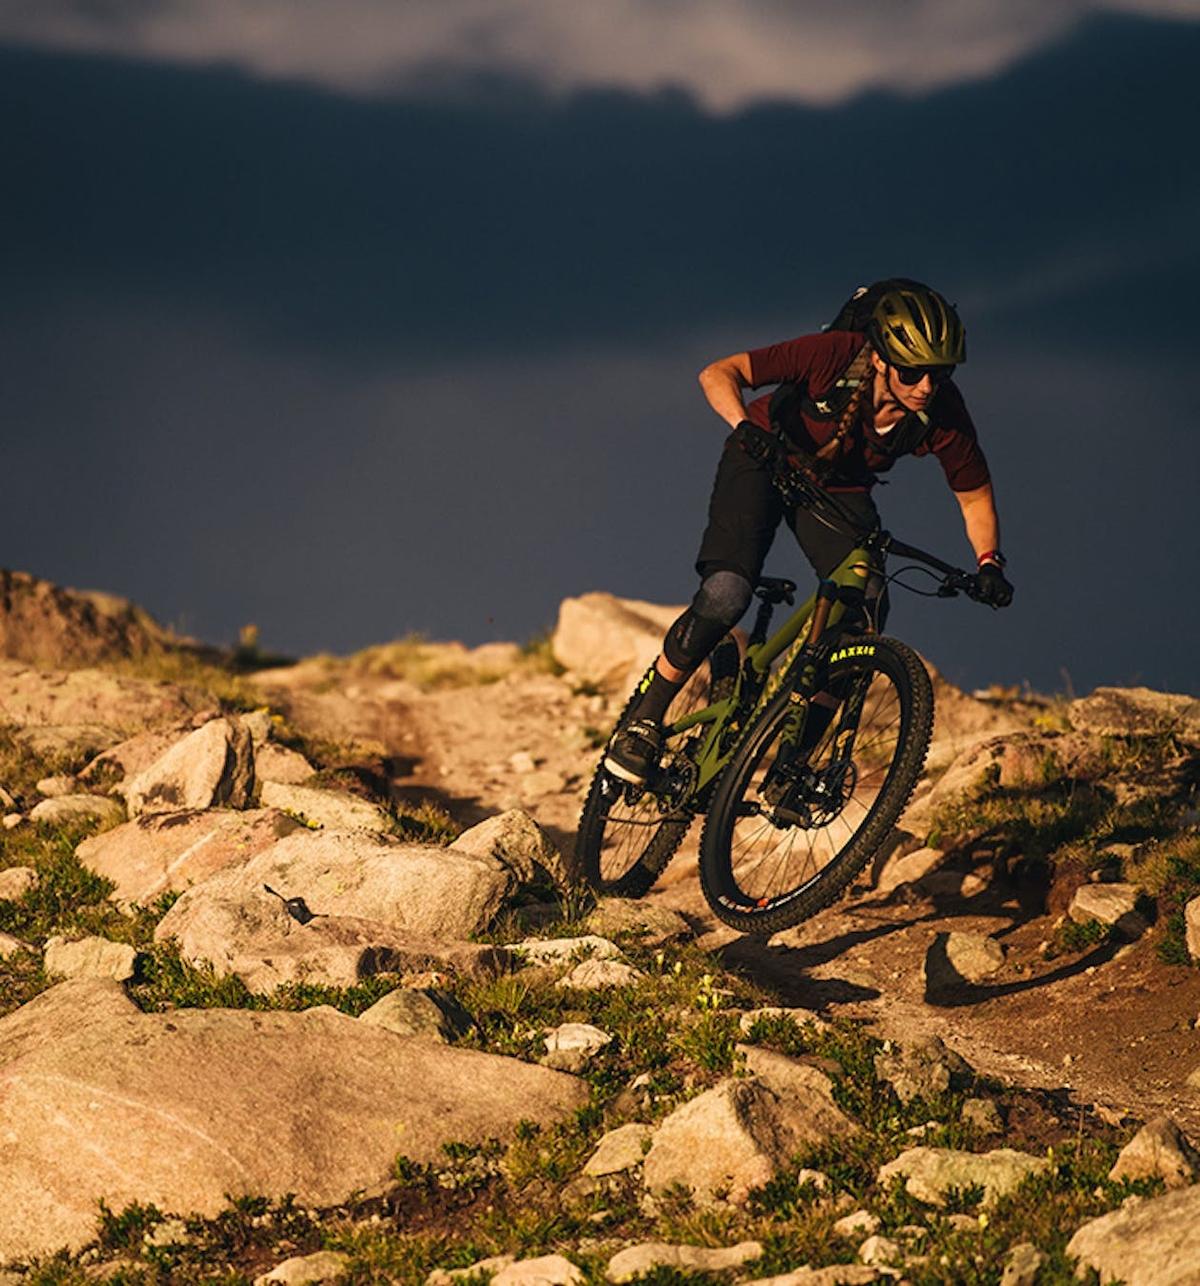 Riding the Juliana Maverick down a singletrack trail surrounded by rocks